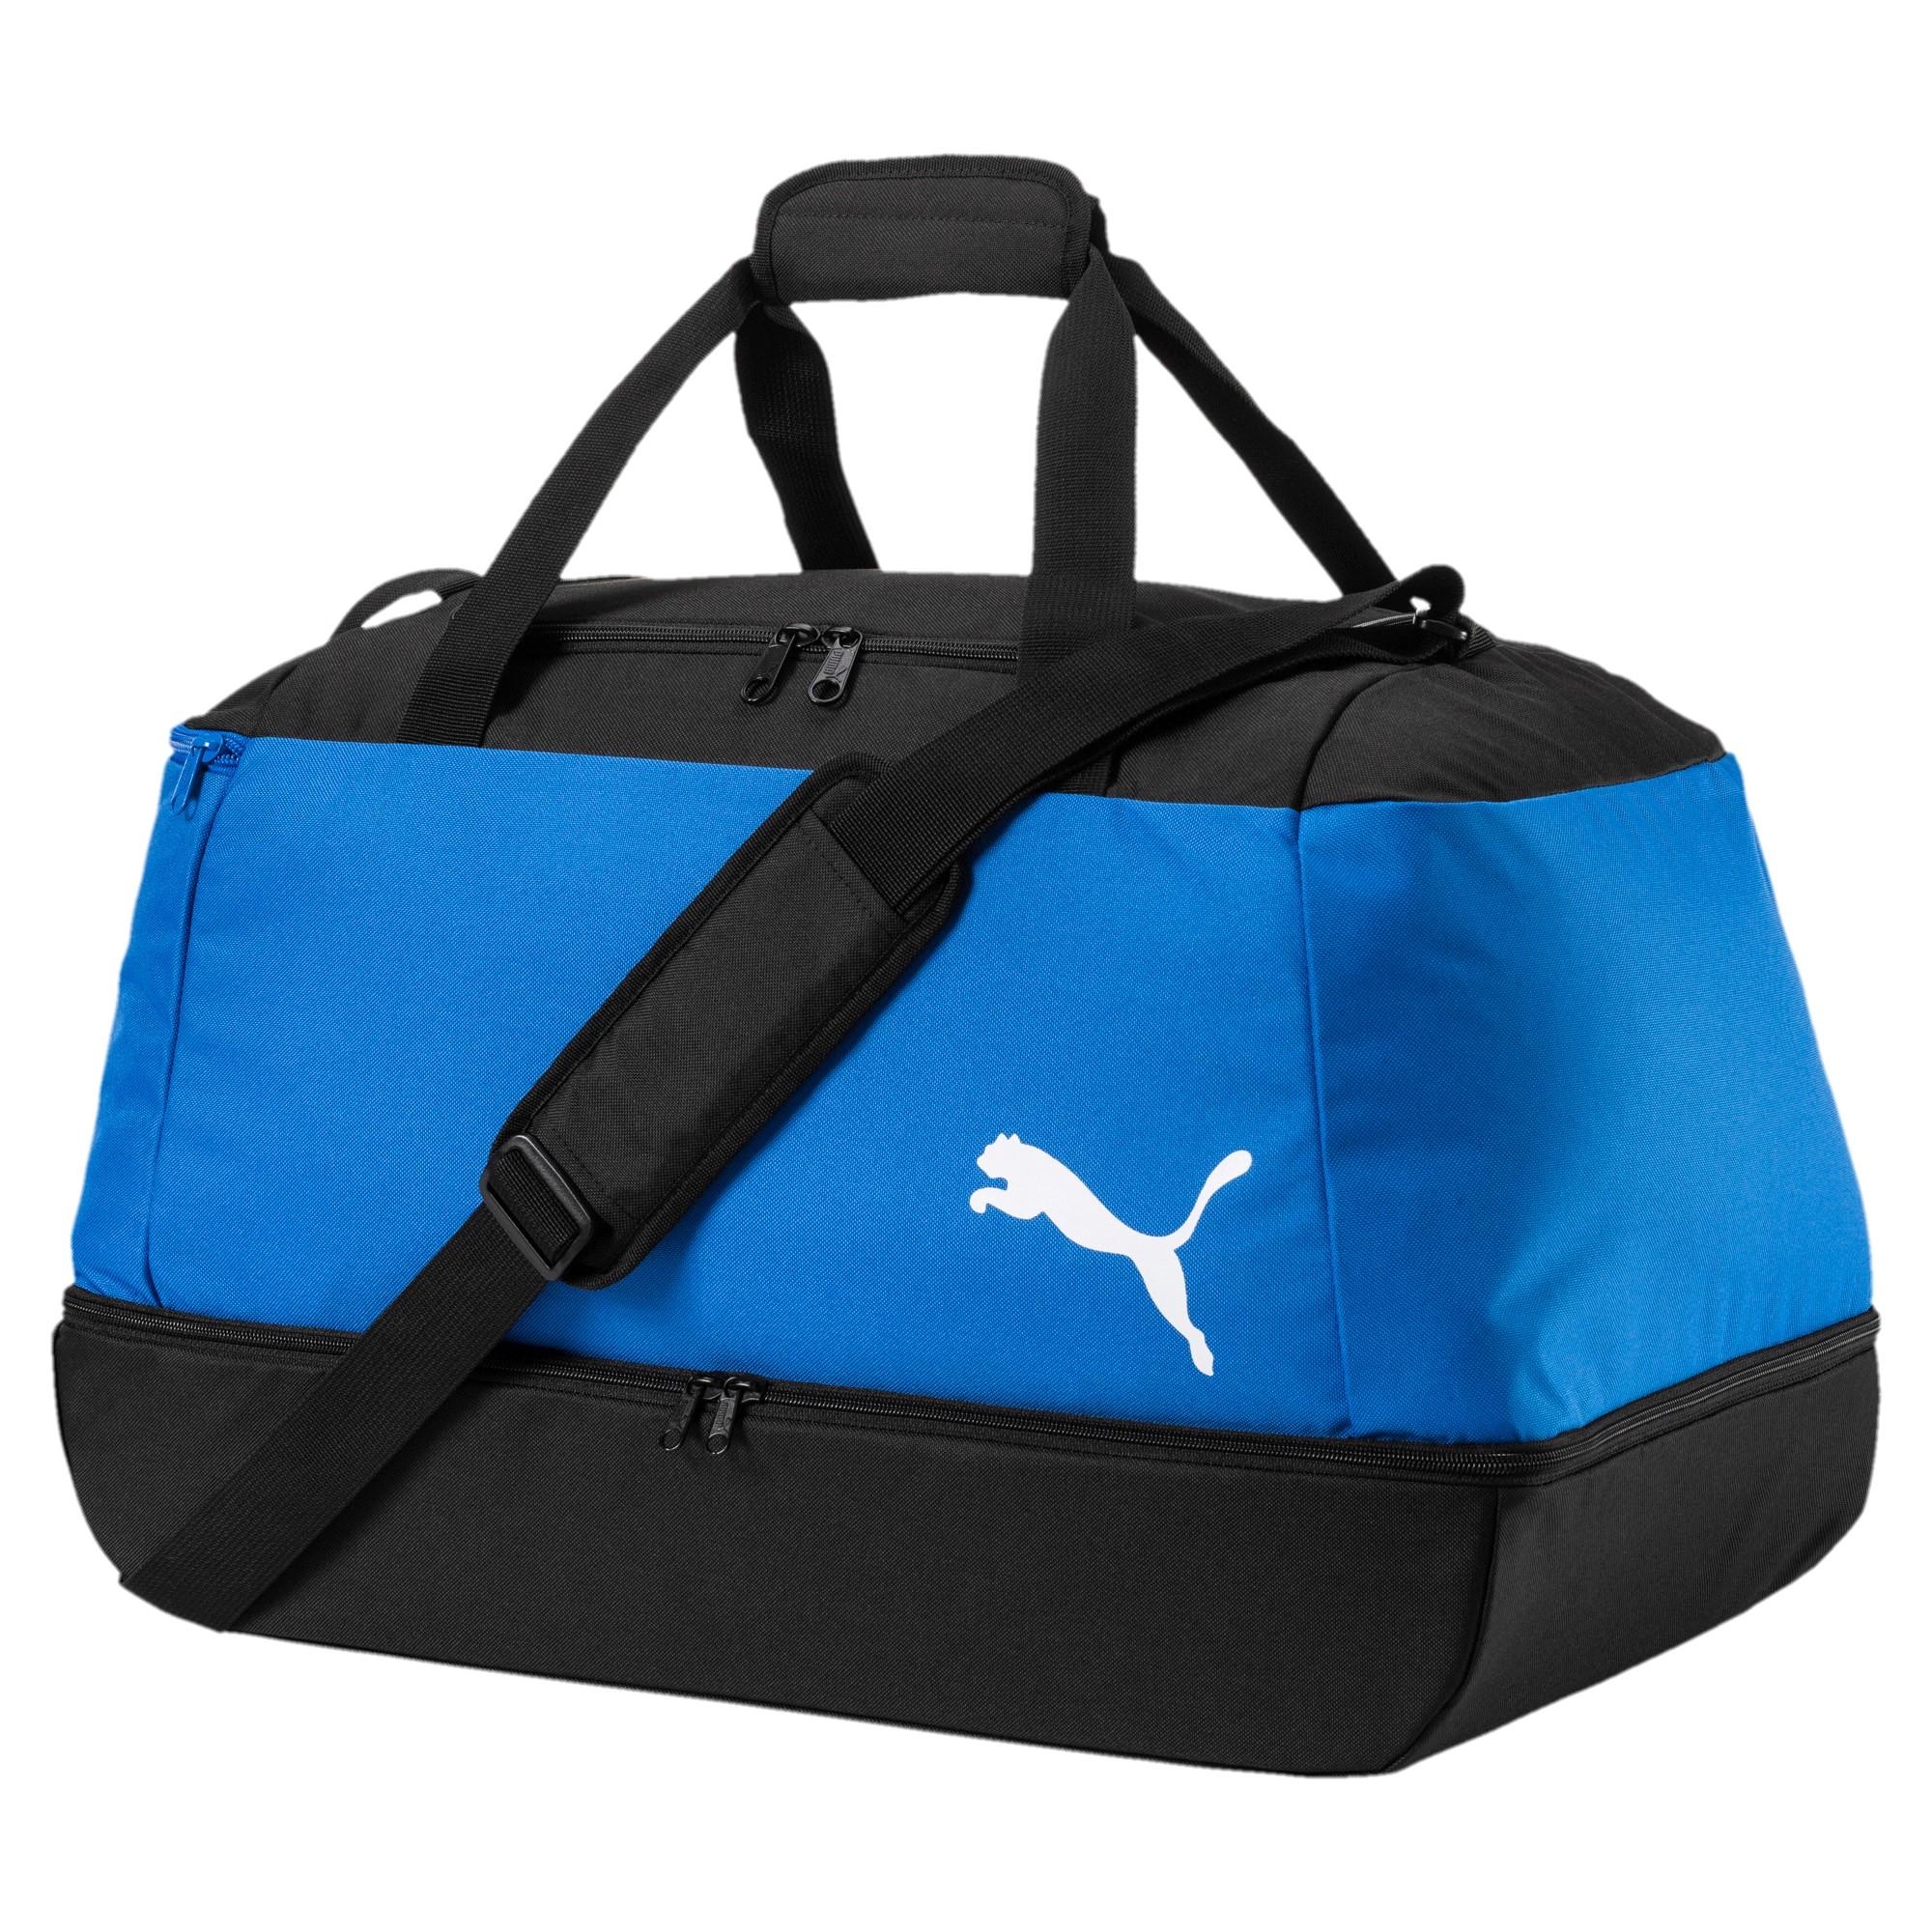 Puma Pro Training II Football Bag Fußball Sporttasche mit Bodenfach 074897 03 blau